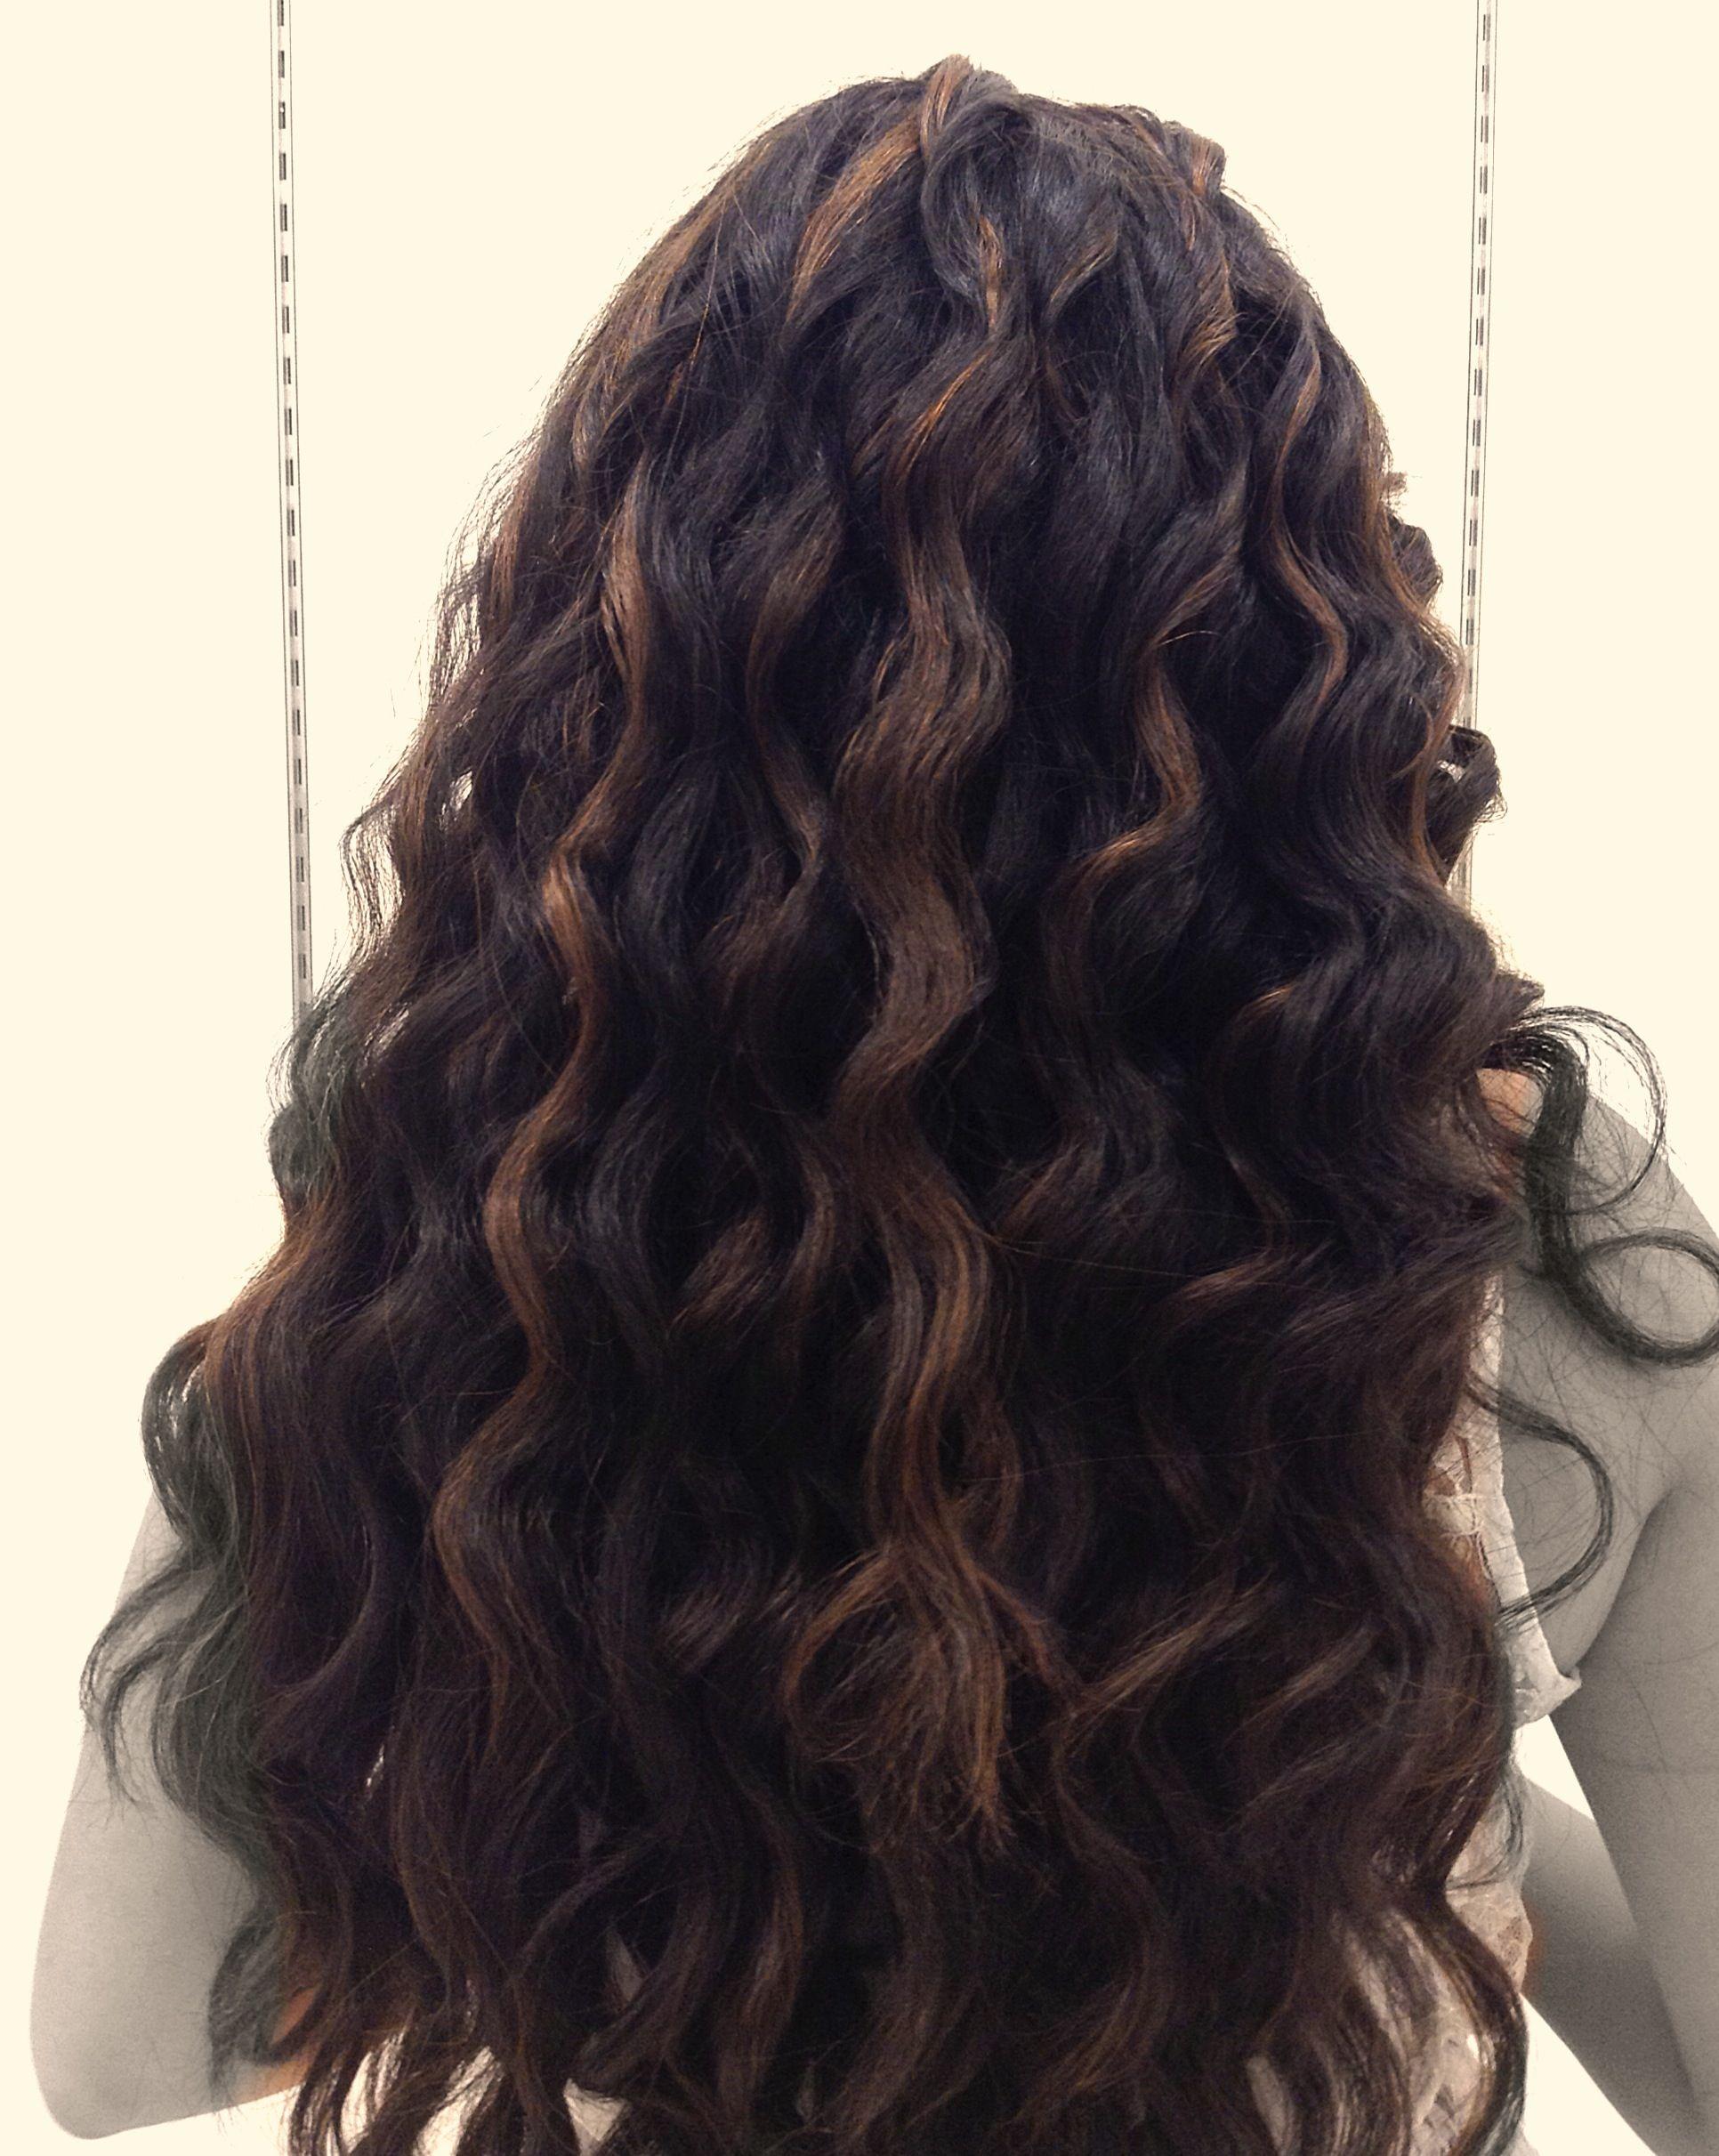 Caramel Highlights On Black Hair Just A Tangle Of Hair